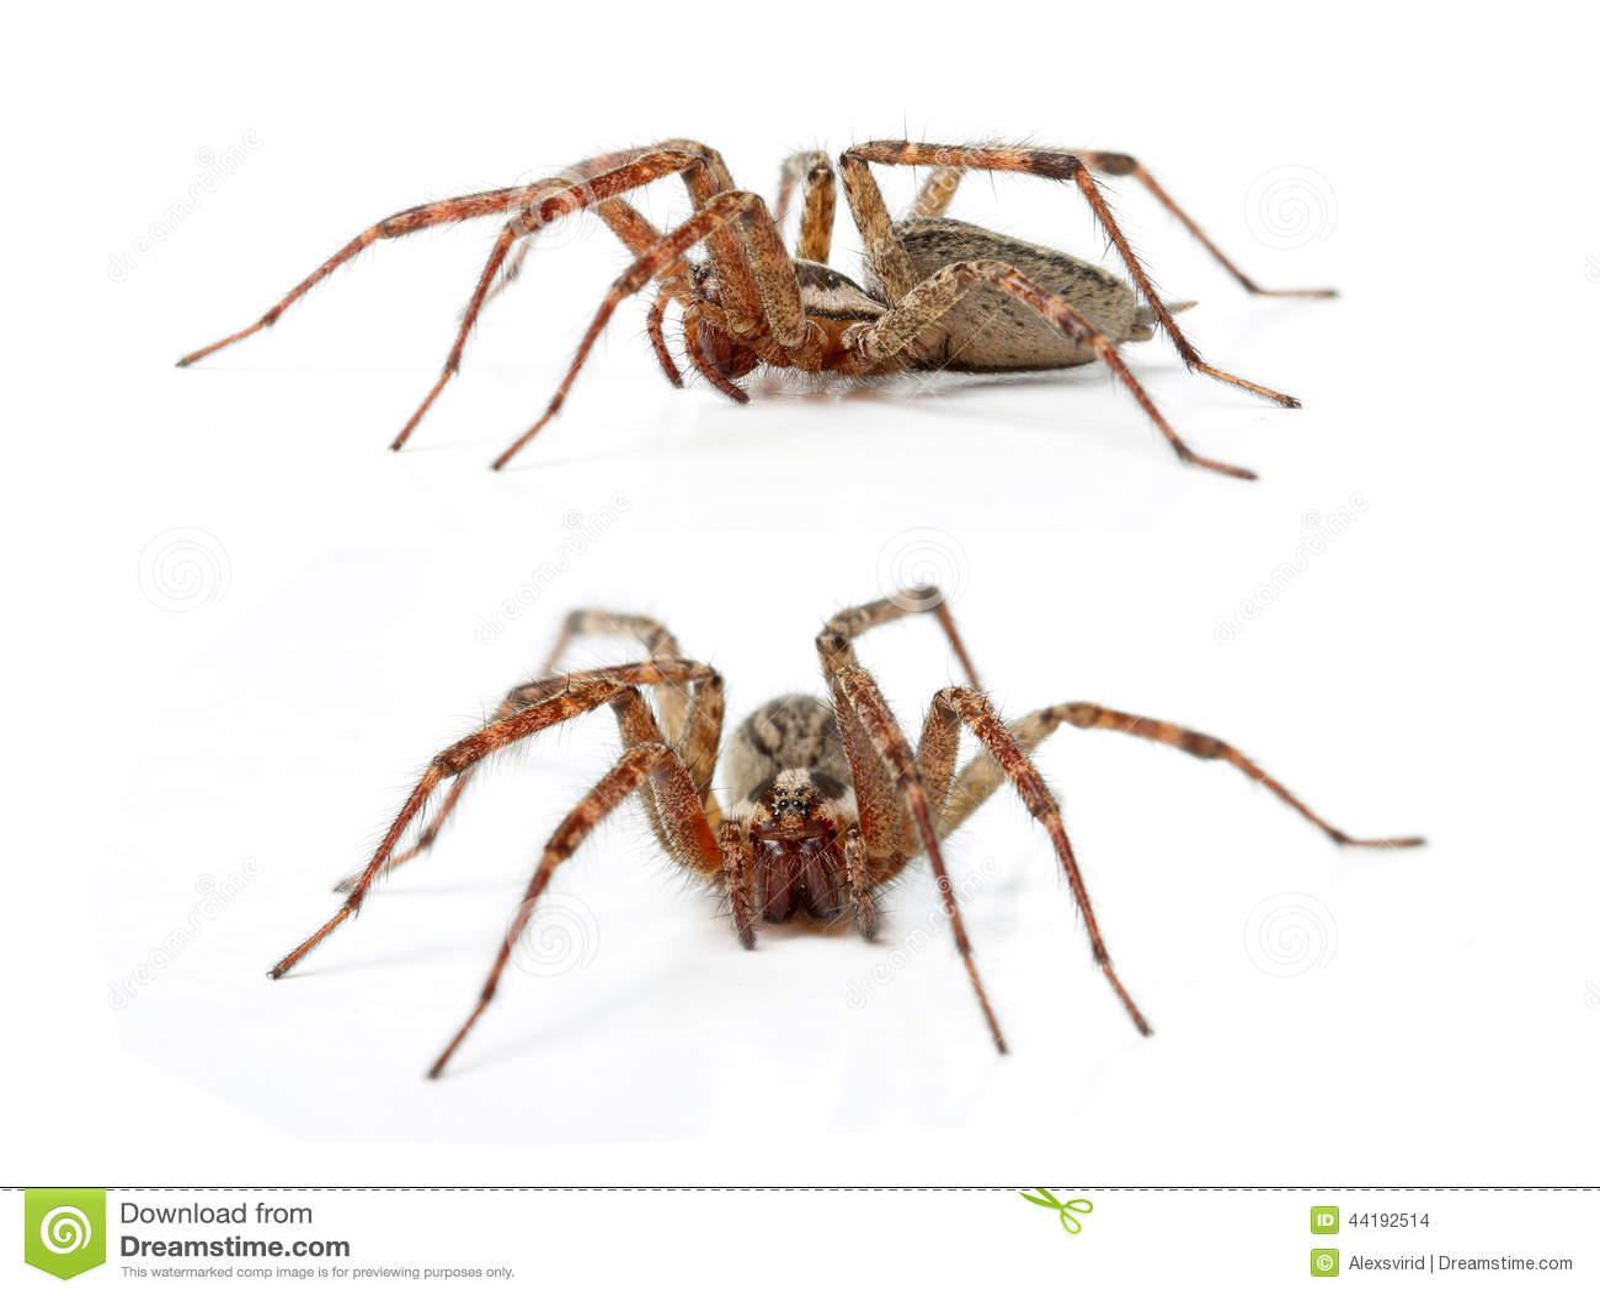 流浪汉蜘蛛, Tegenaria Agrestis